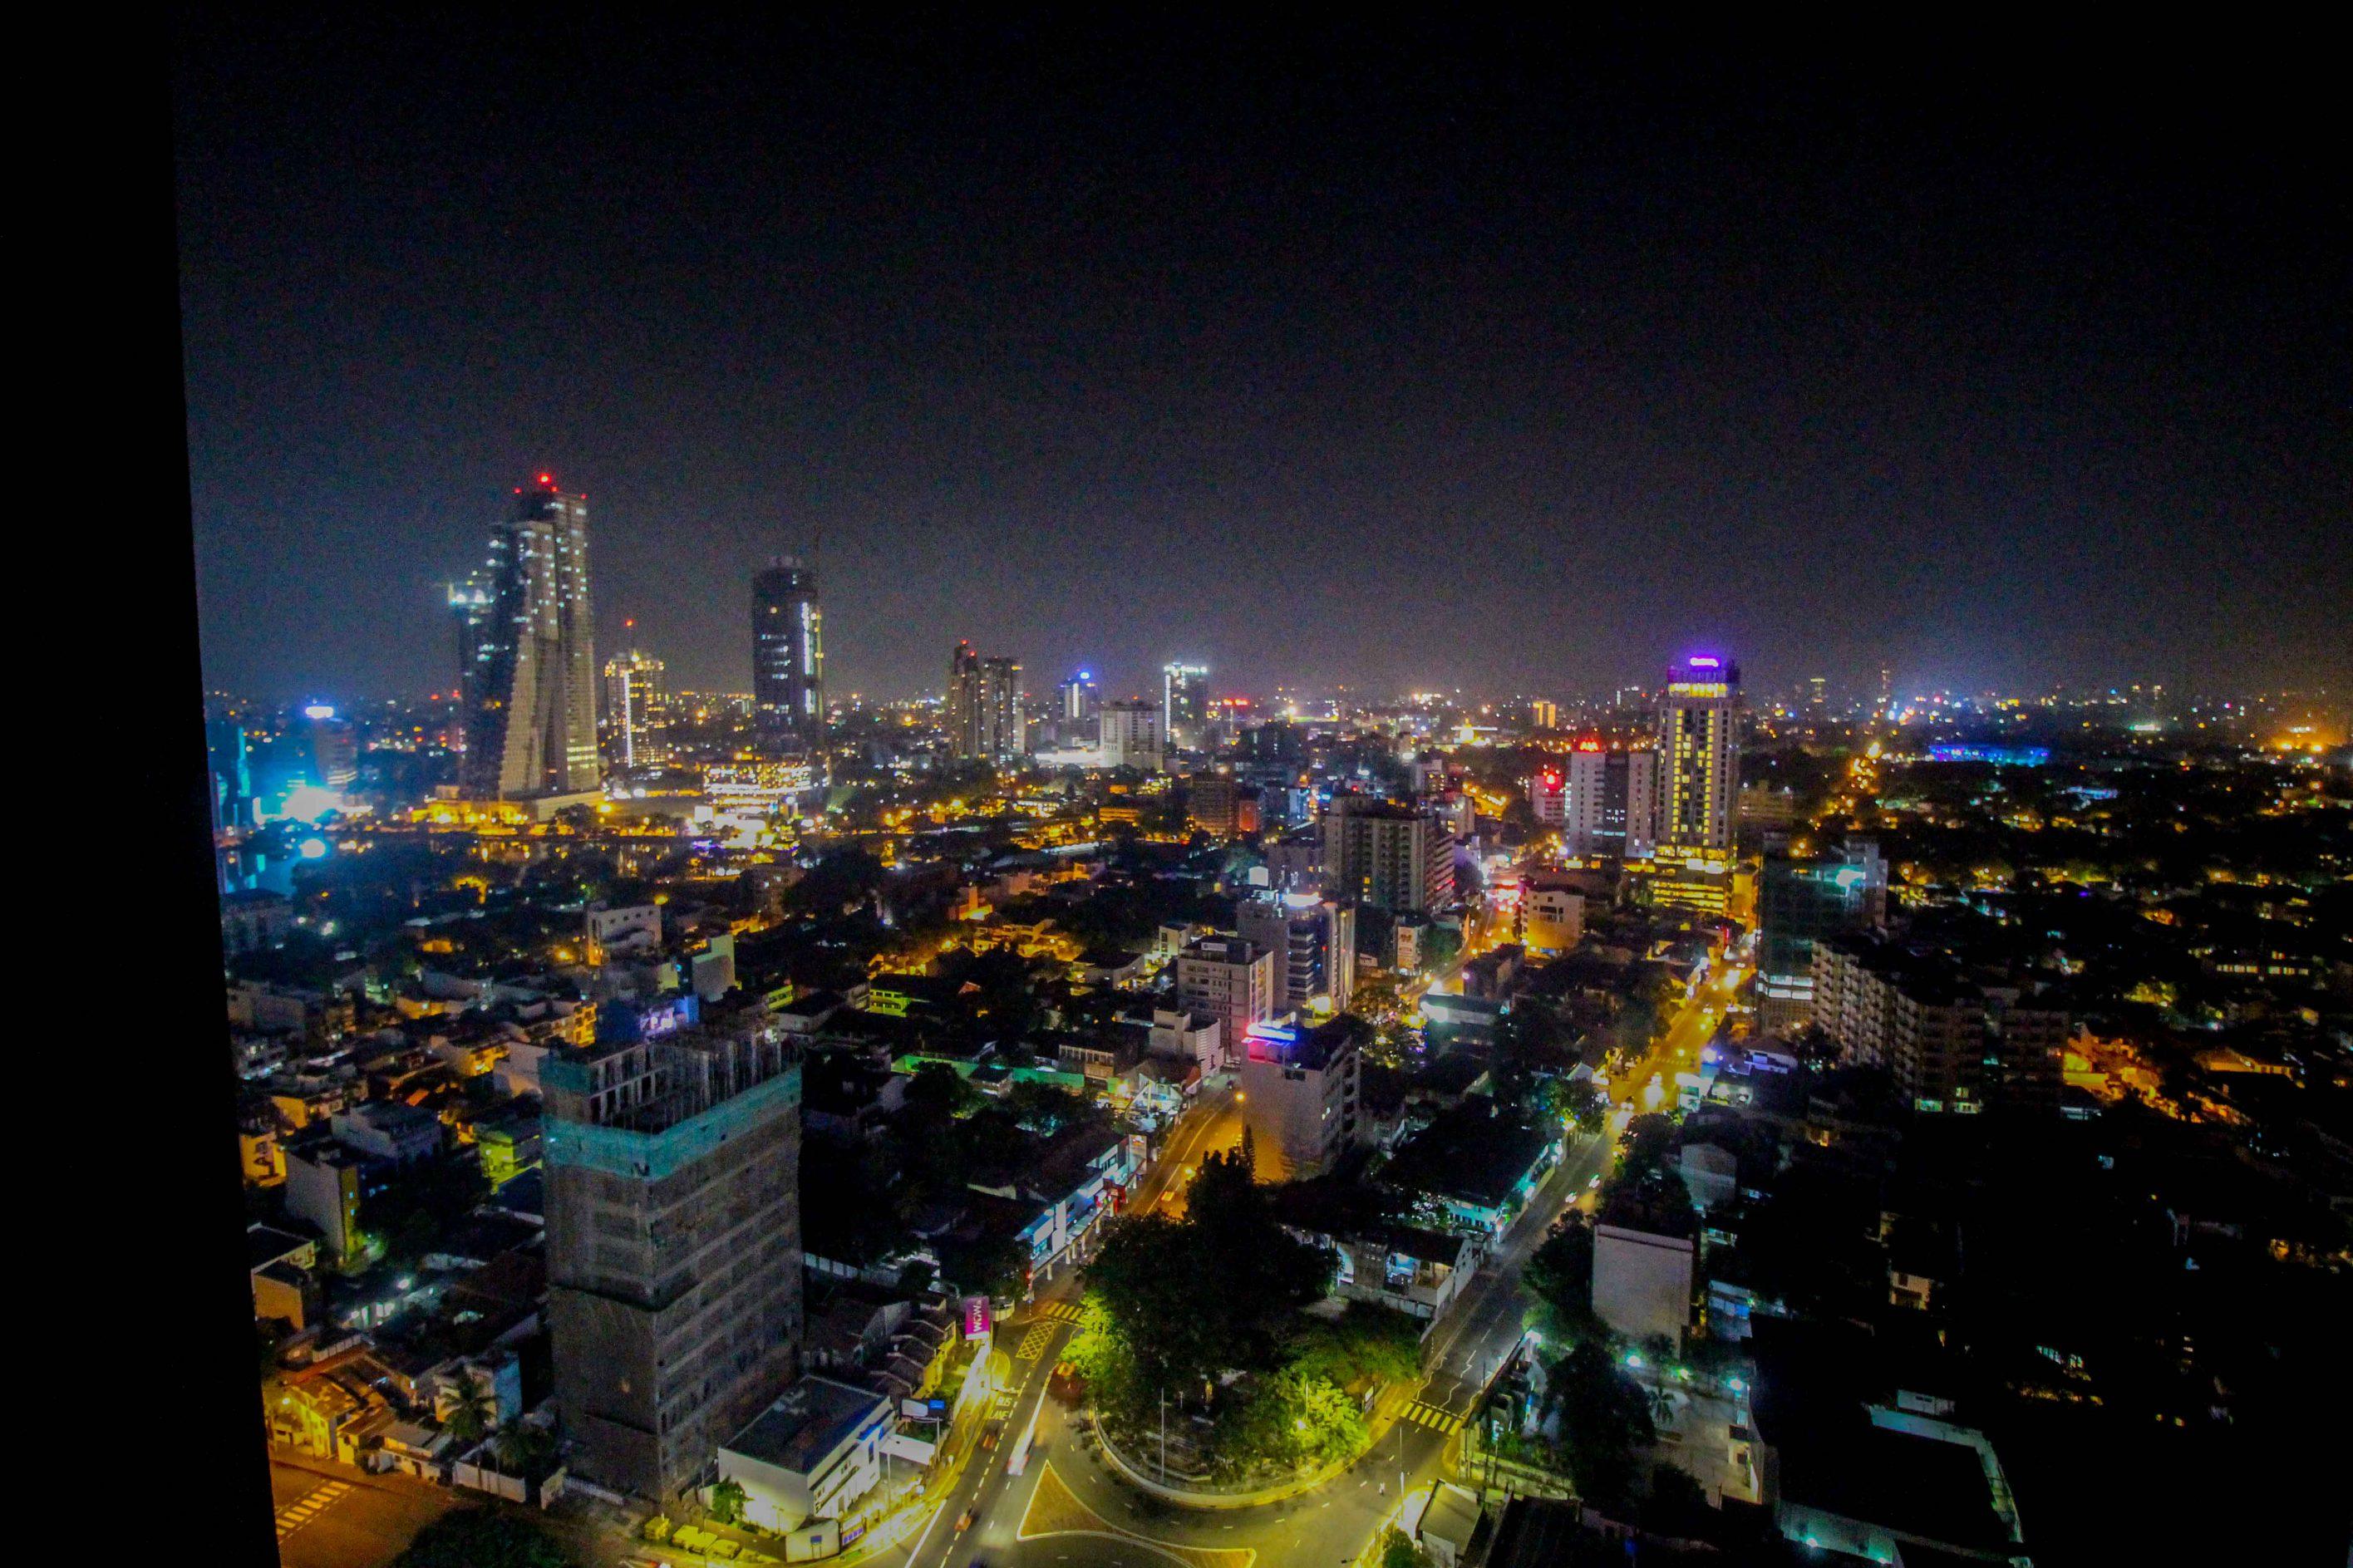 Rooftop Colombo Skyline by night Mövenpick Colombo Hotel Reiseblog Brinisfashionbook bestes Hotel Sri Lanka